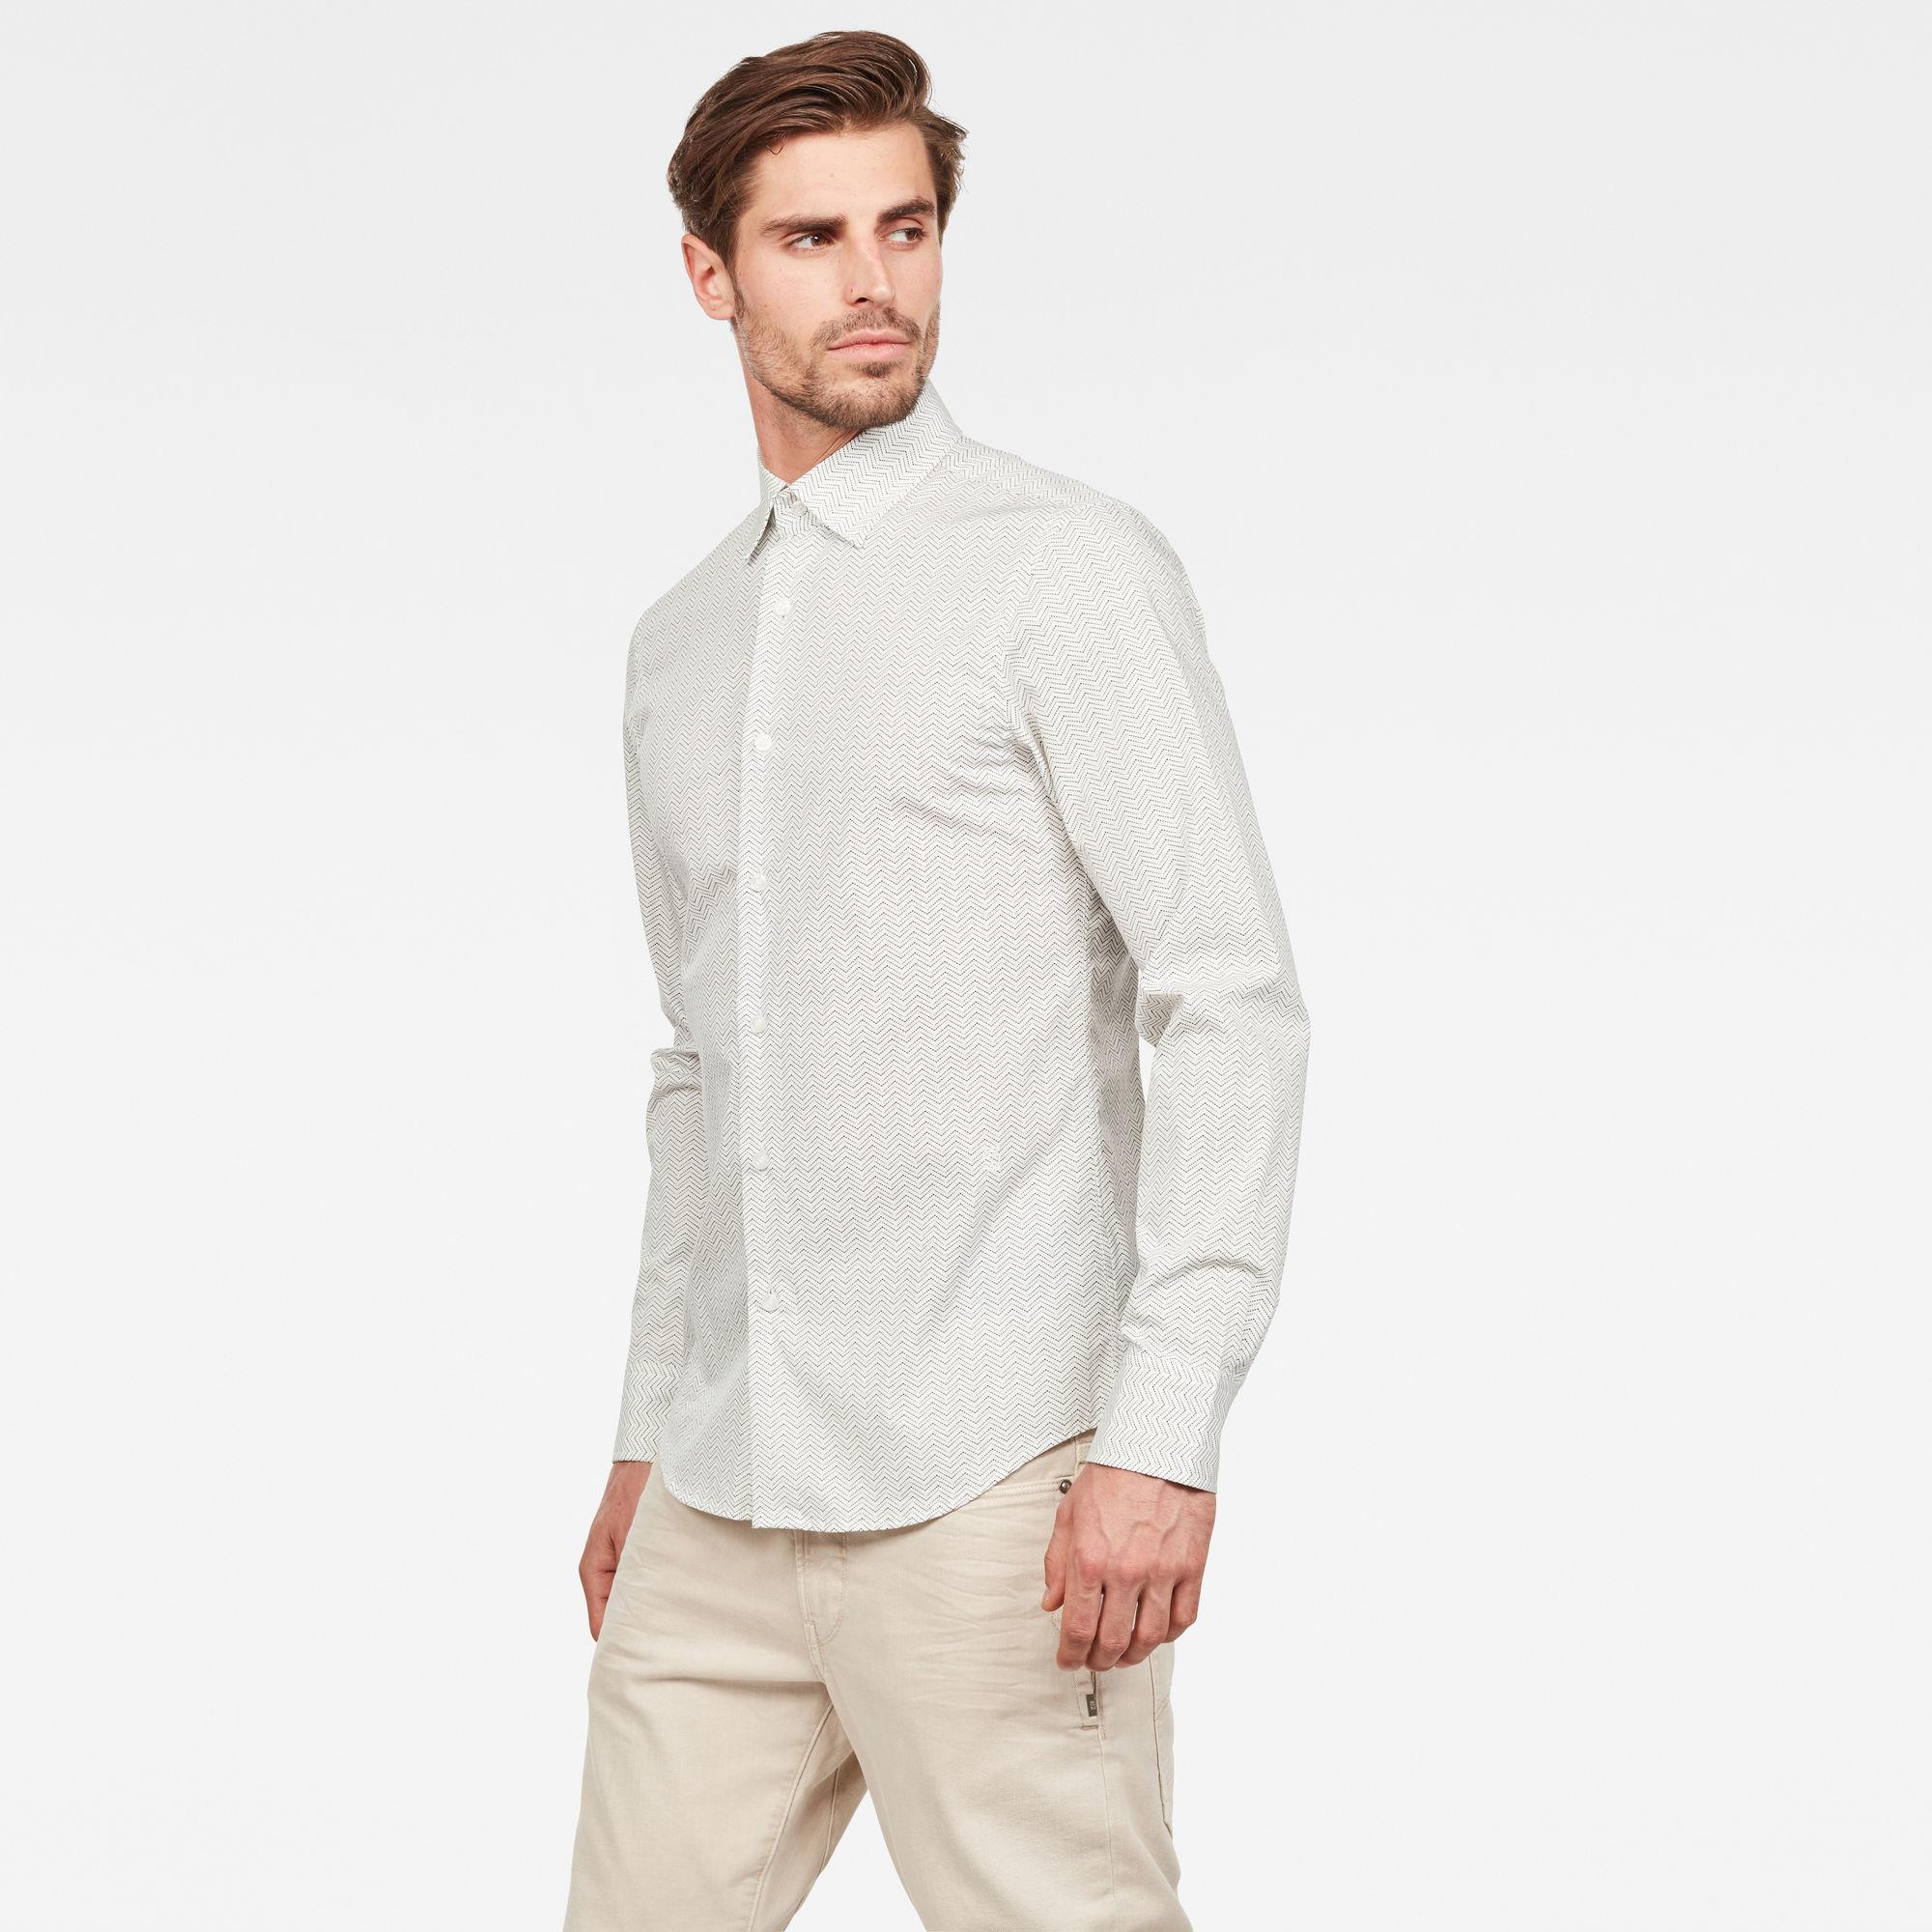 G-Star G-Star Core Super Slim Shirt B554 White/Grey